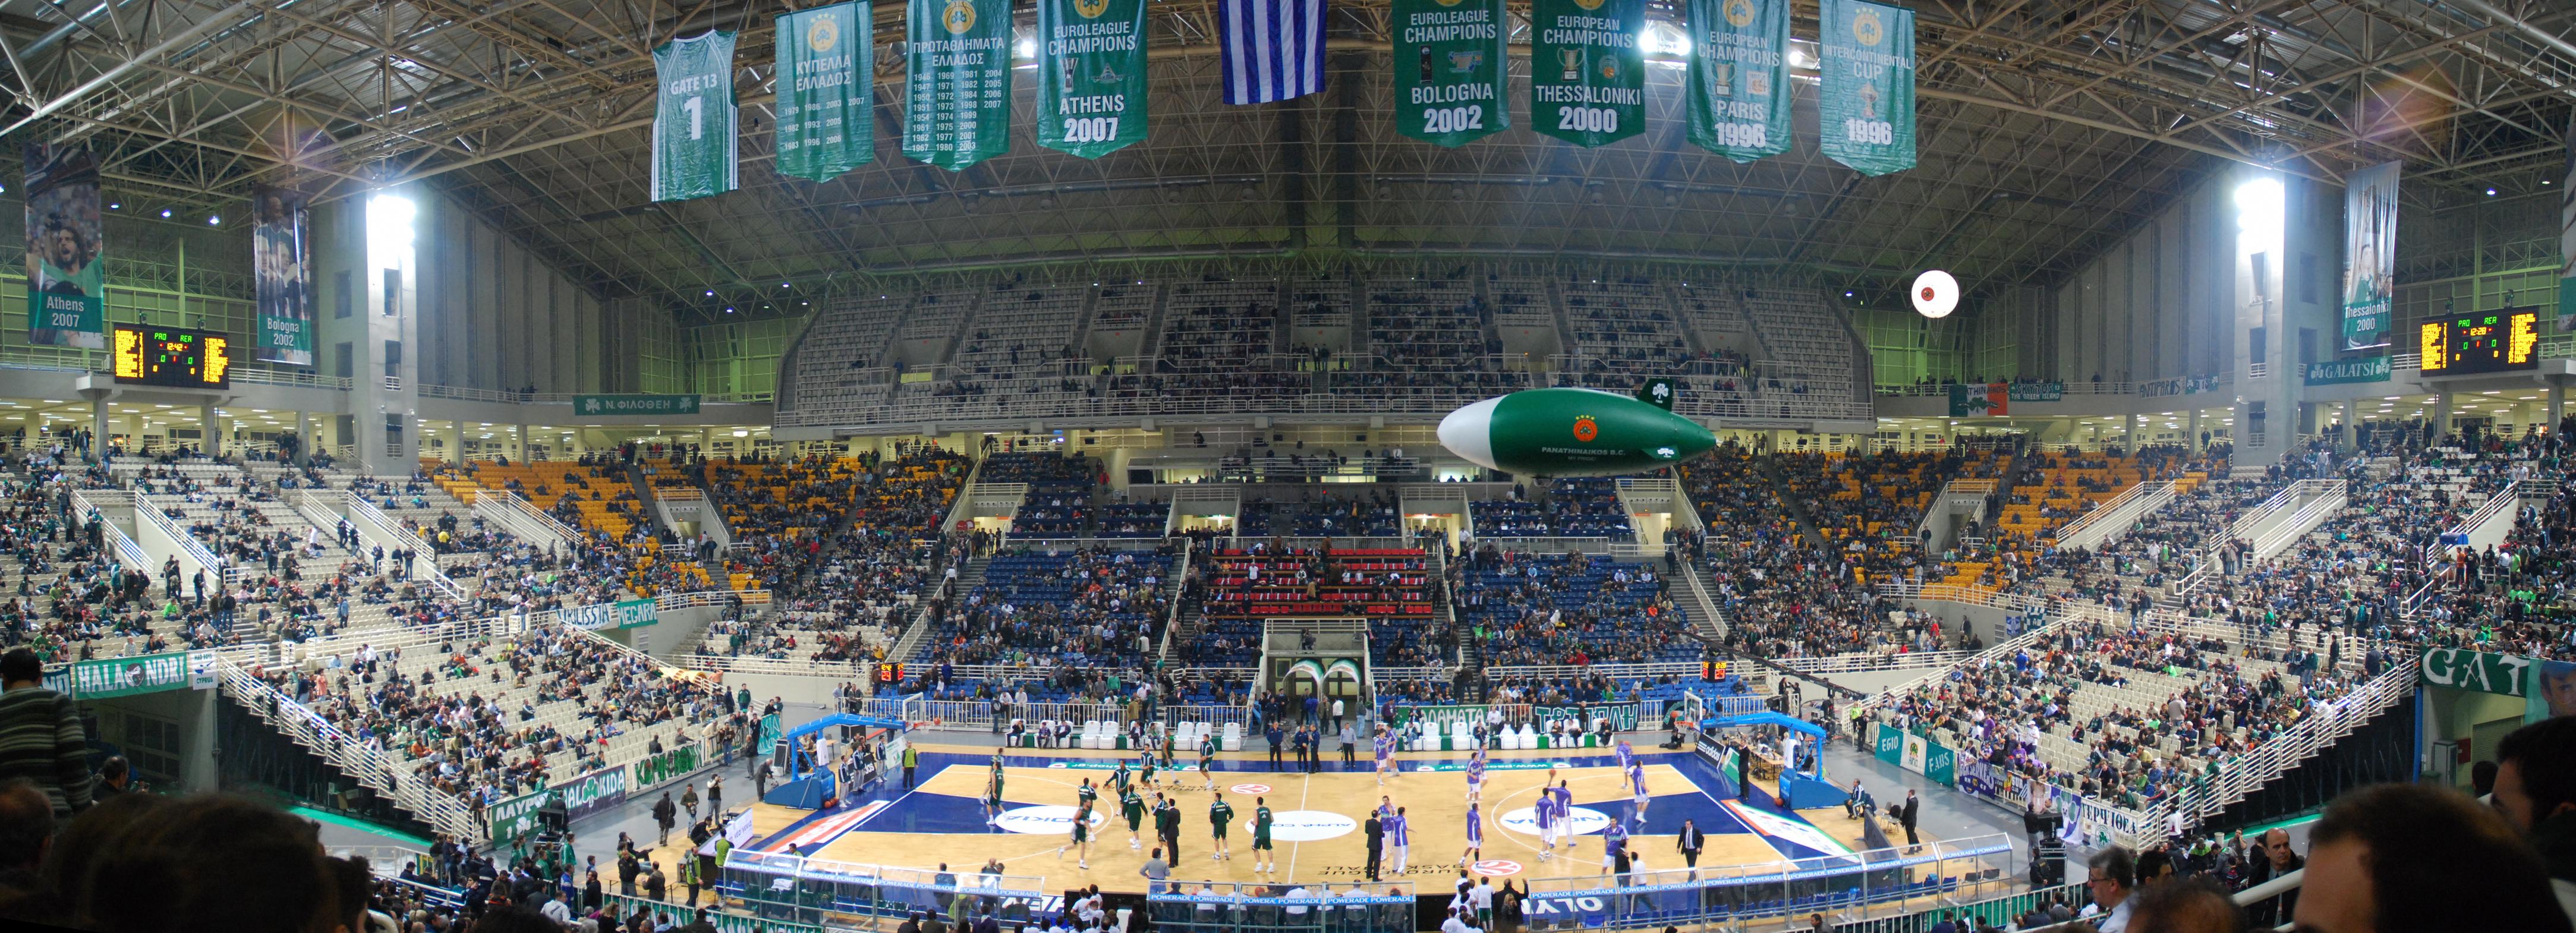 Interior_of_OAKA_Olympic_Indoor_Hall,_Athens